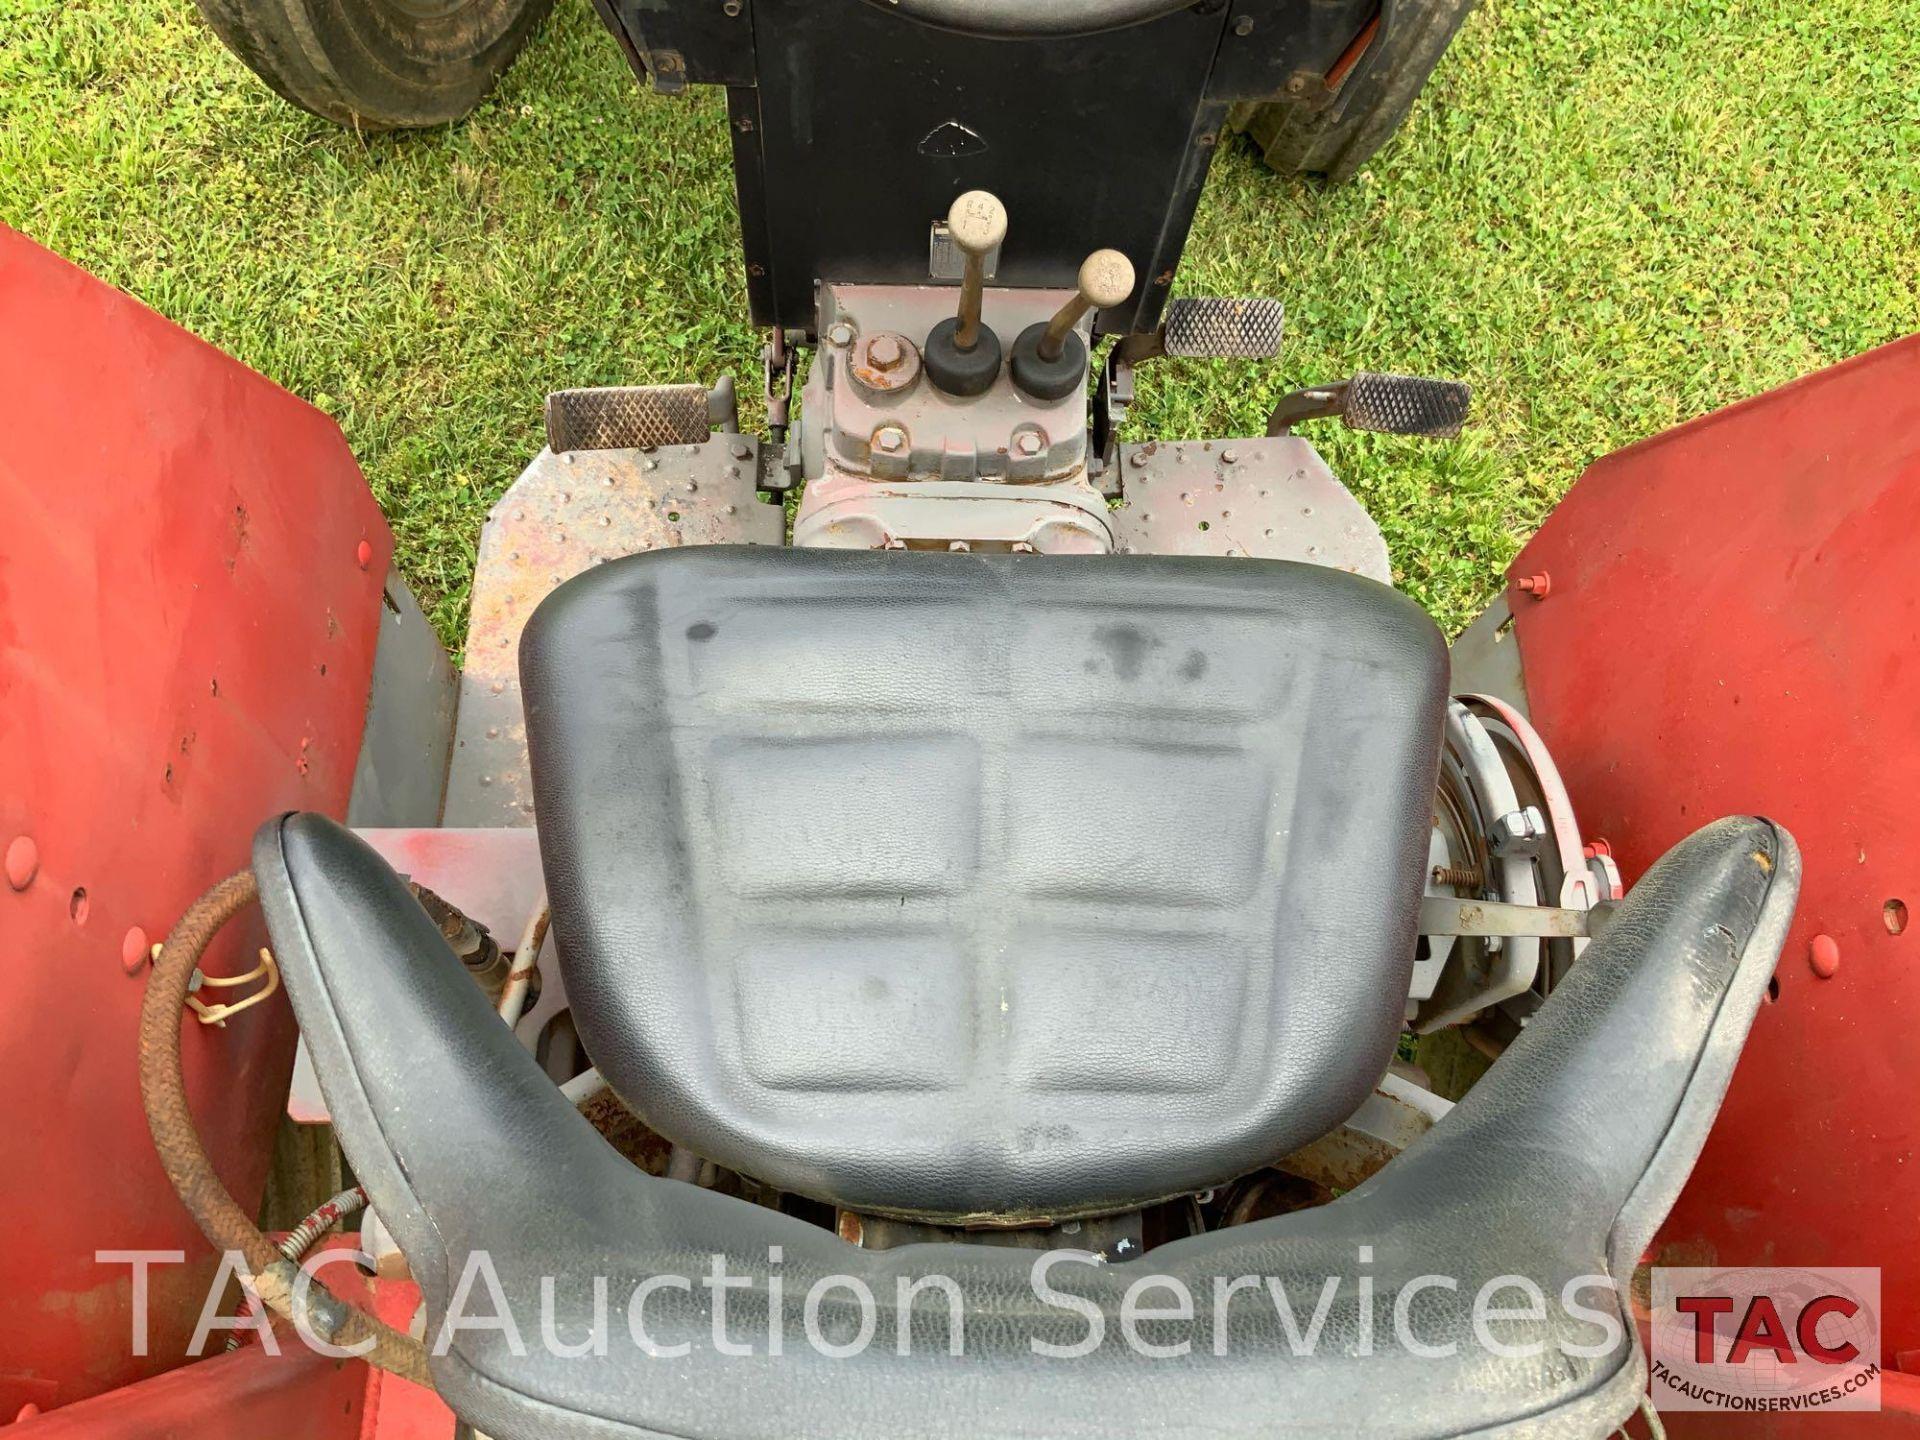 Massey Ferguson 275 Farm Tractor - Image 16 of 25